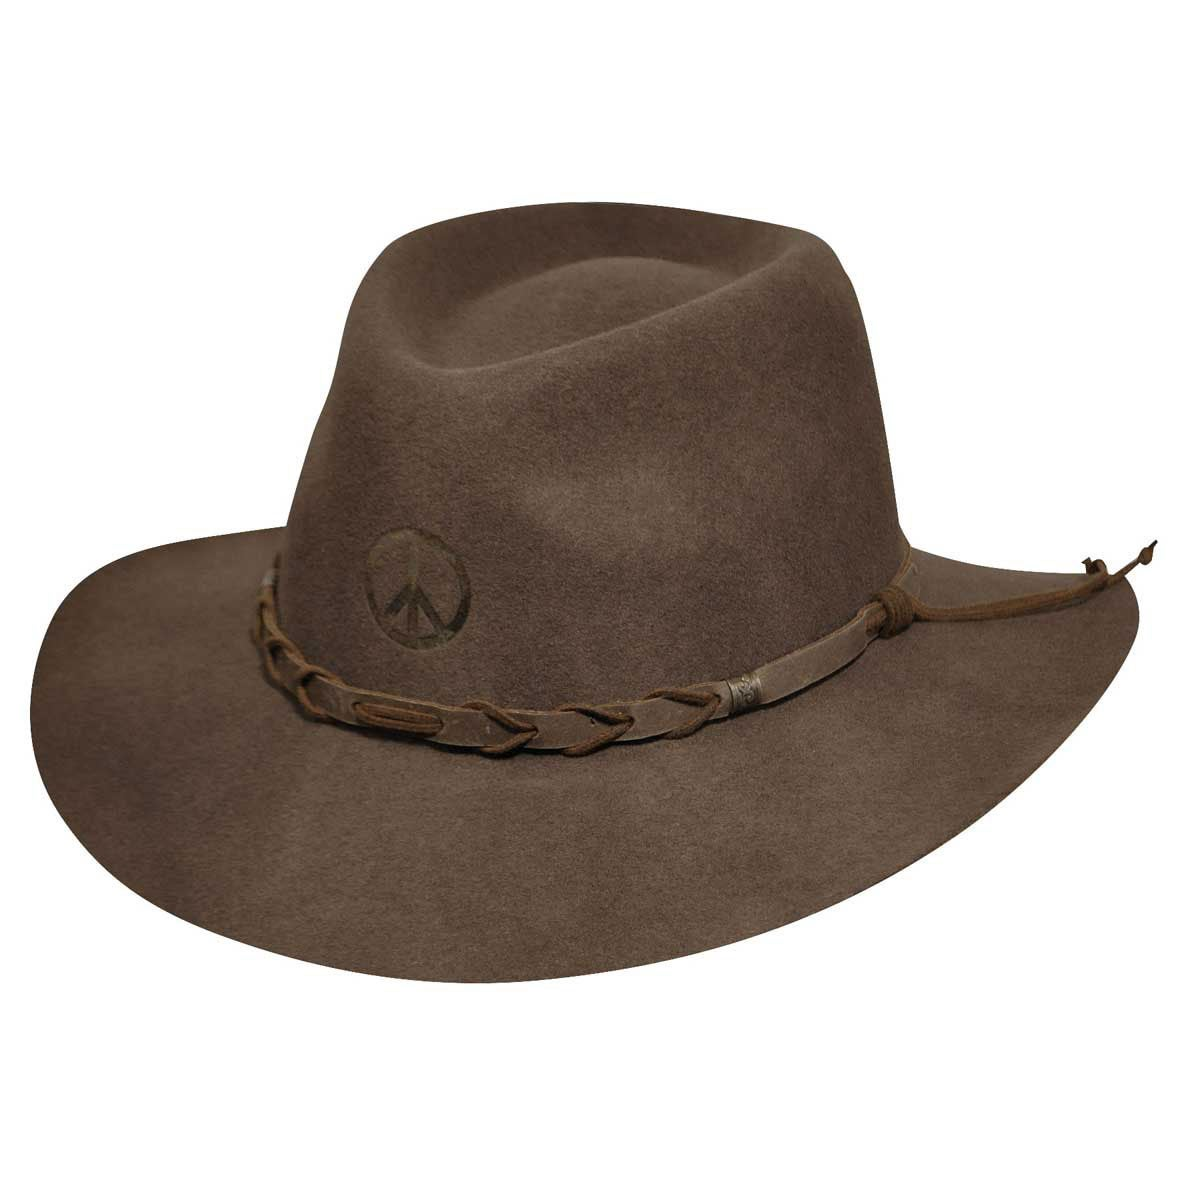 1960s Style Men's Hats 1960s Bollman Collection Hippie $100.00 AT vintagedancer.com